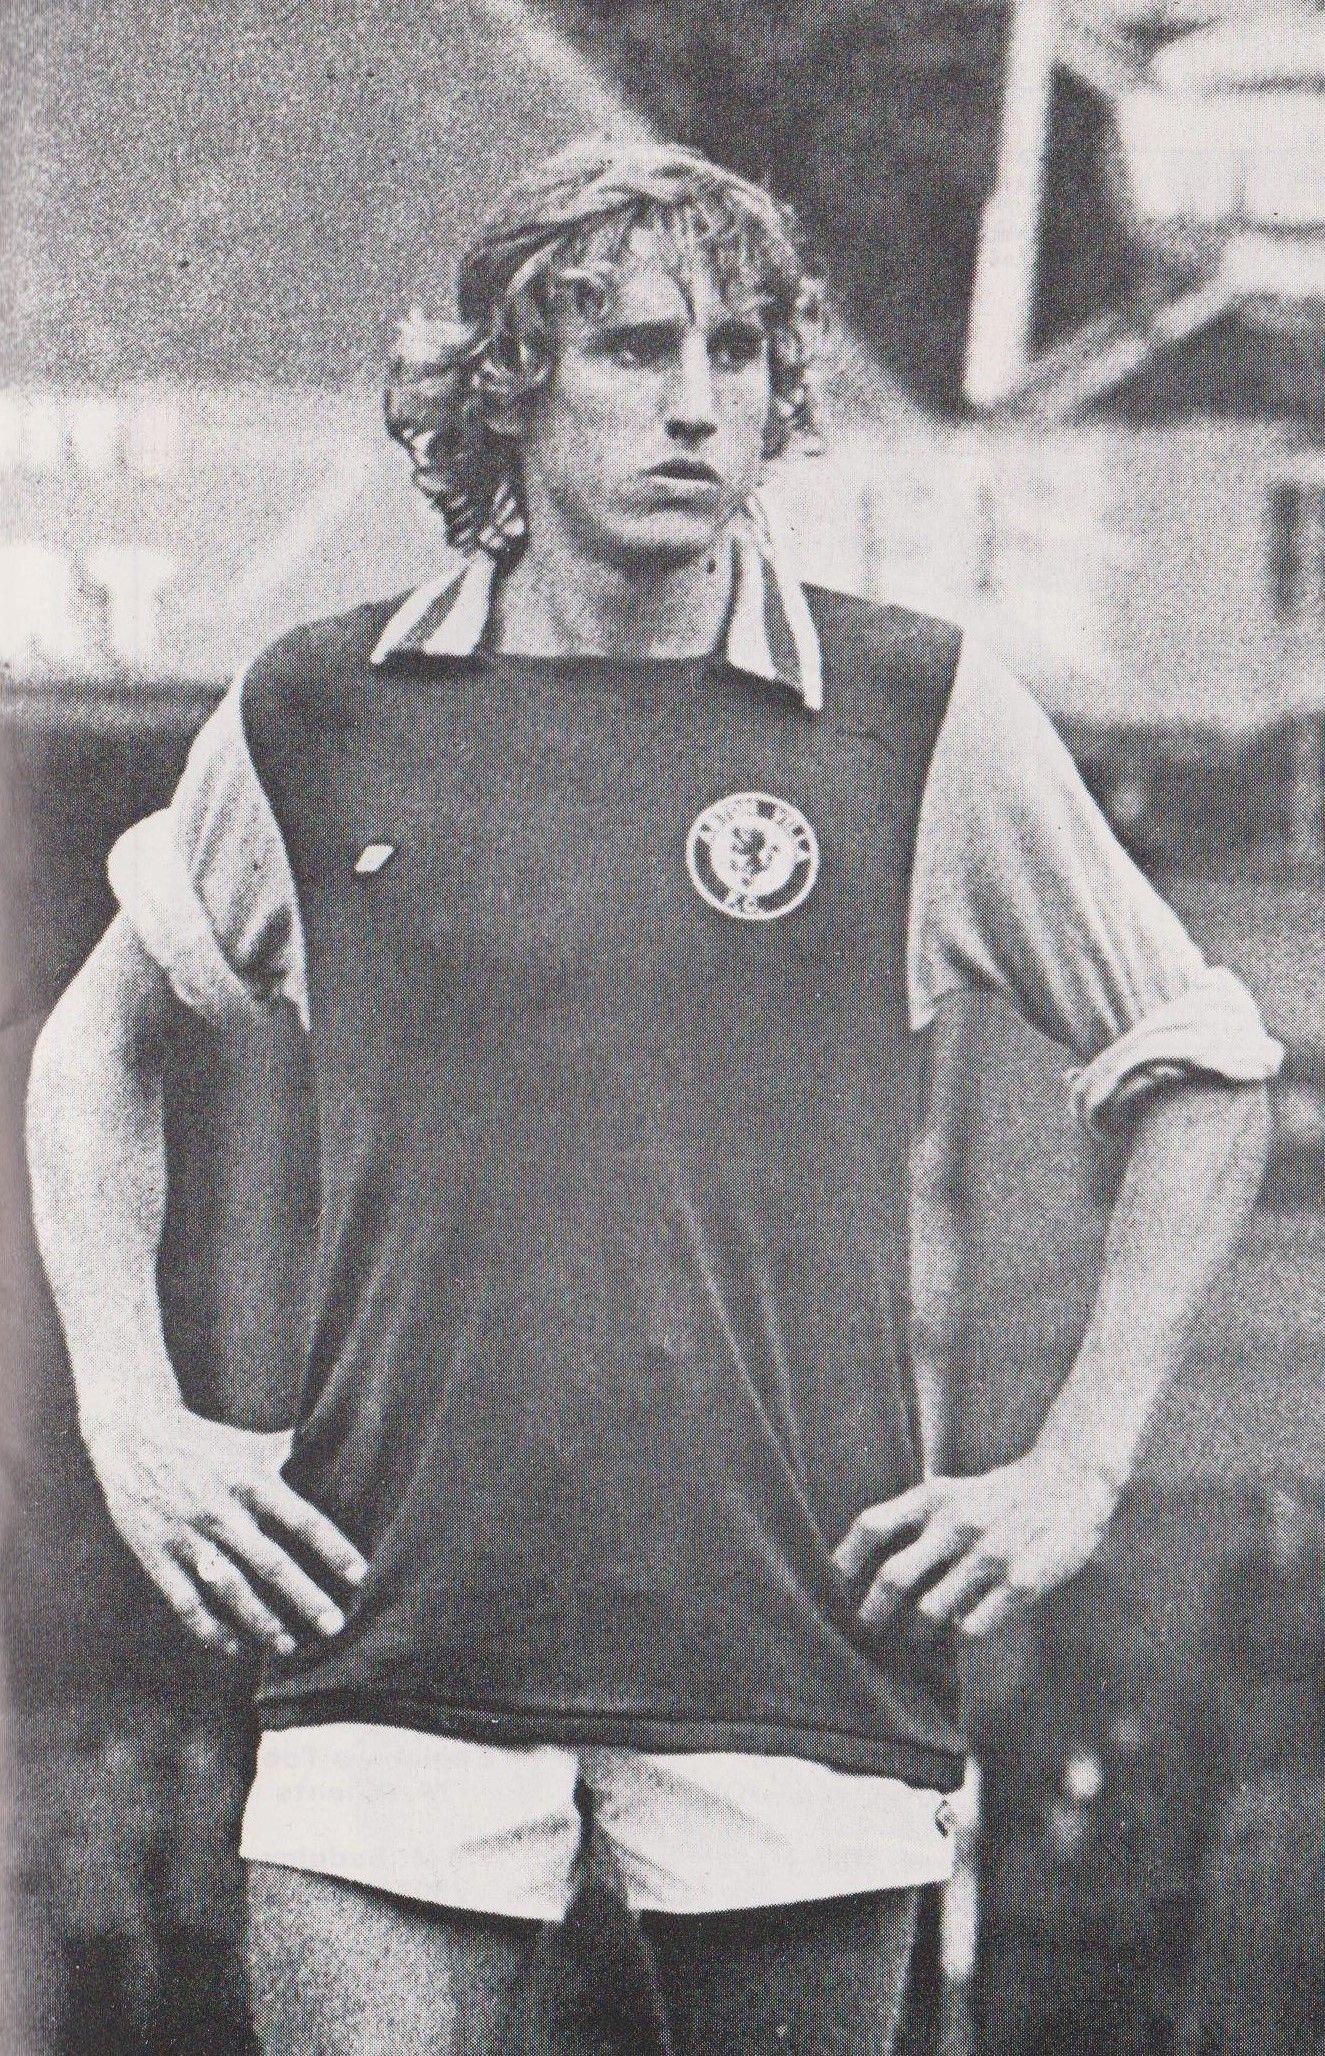 Frank Carrodus Aston Villa 1974/75 Aston villa, Villa, 1970s